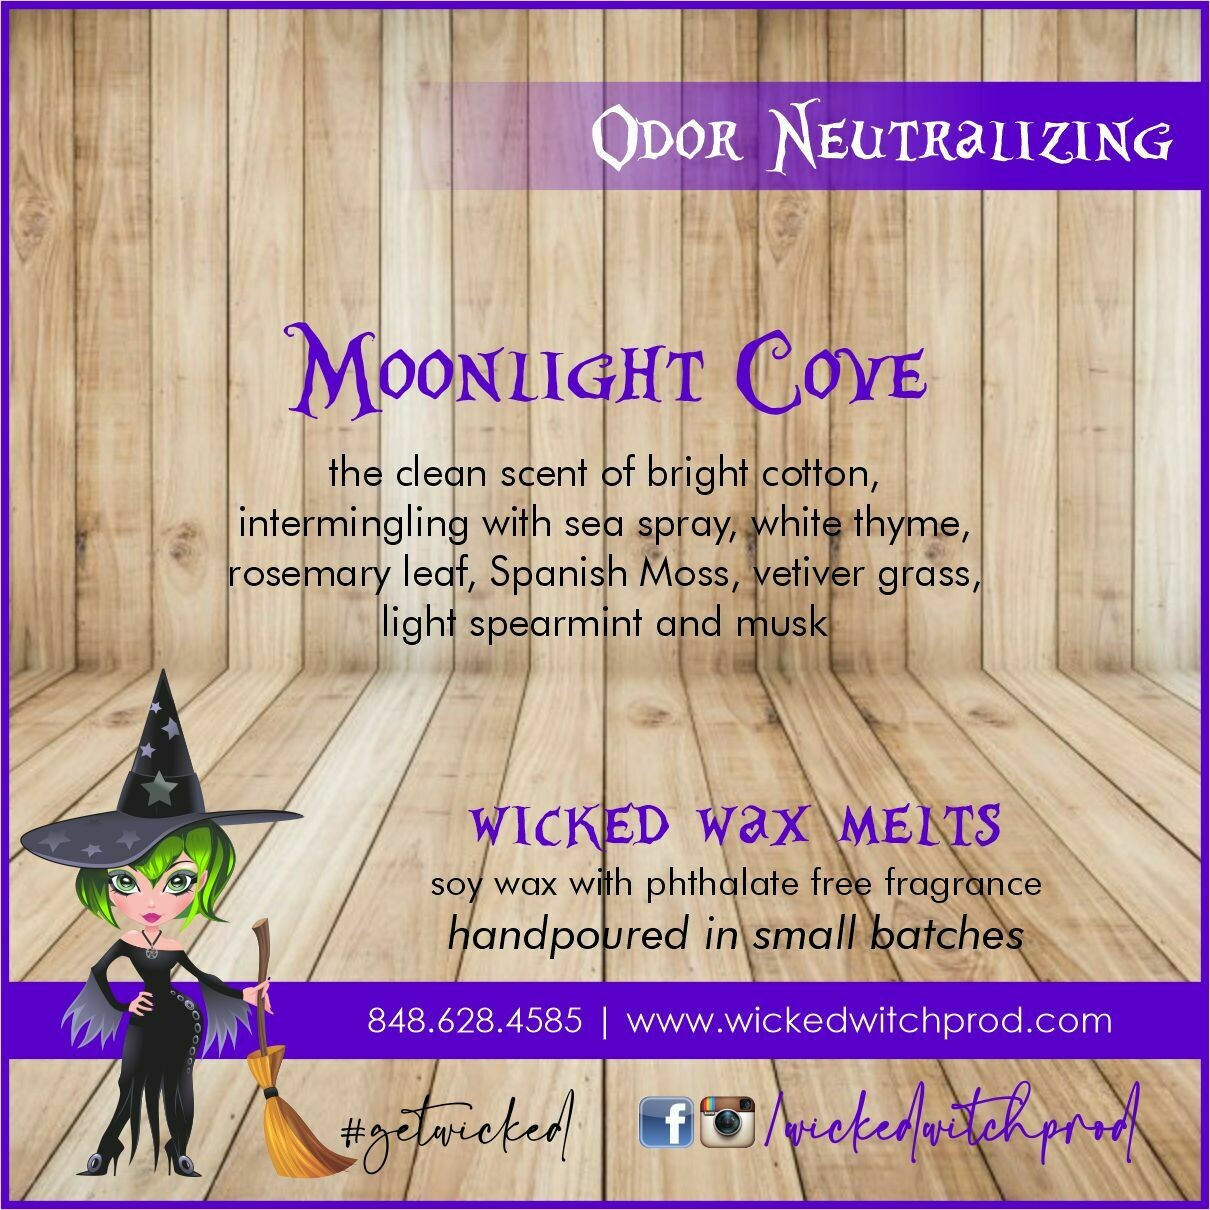 Moonlight Cove Odor Neutralizing Wax Melt